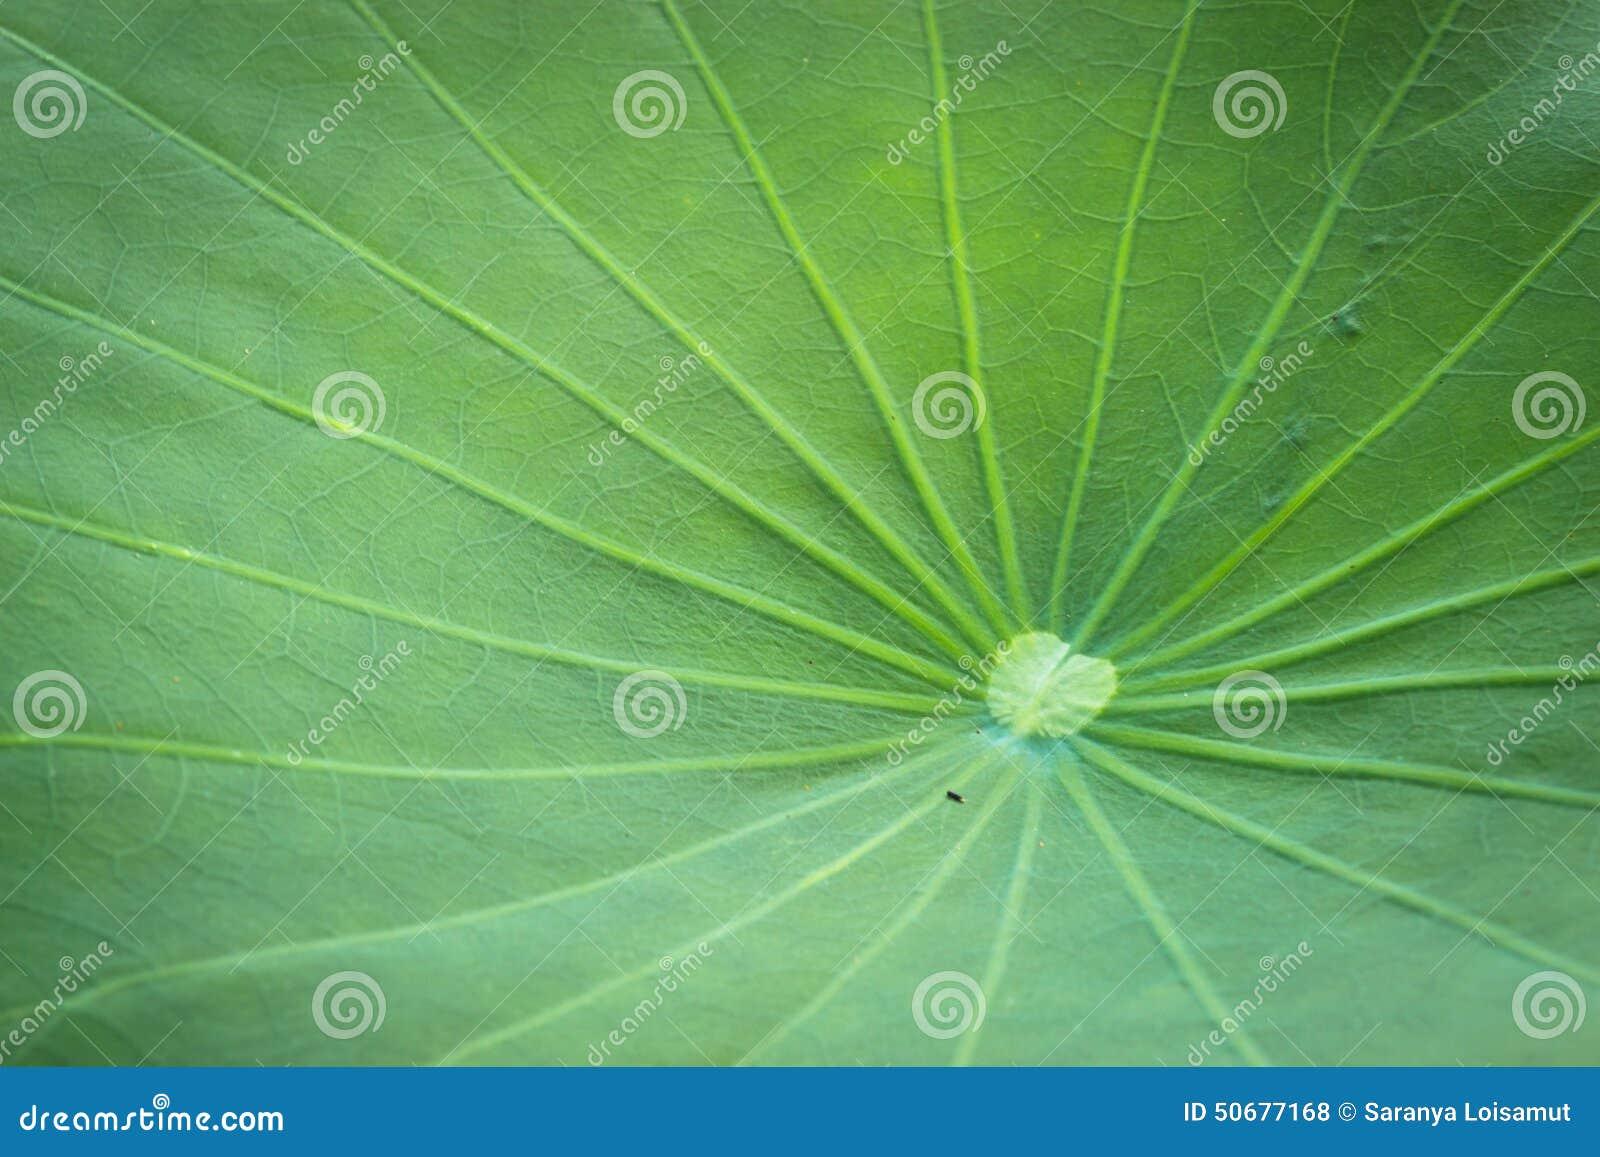 Download 莲花叶子 库存照片. 图片 包括有 绿色, benetton, 告诉, 的treadled, 莲花, 款待 - 50677168